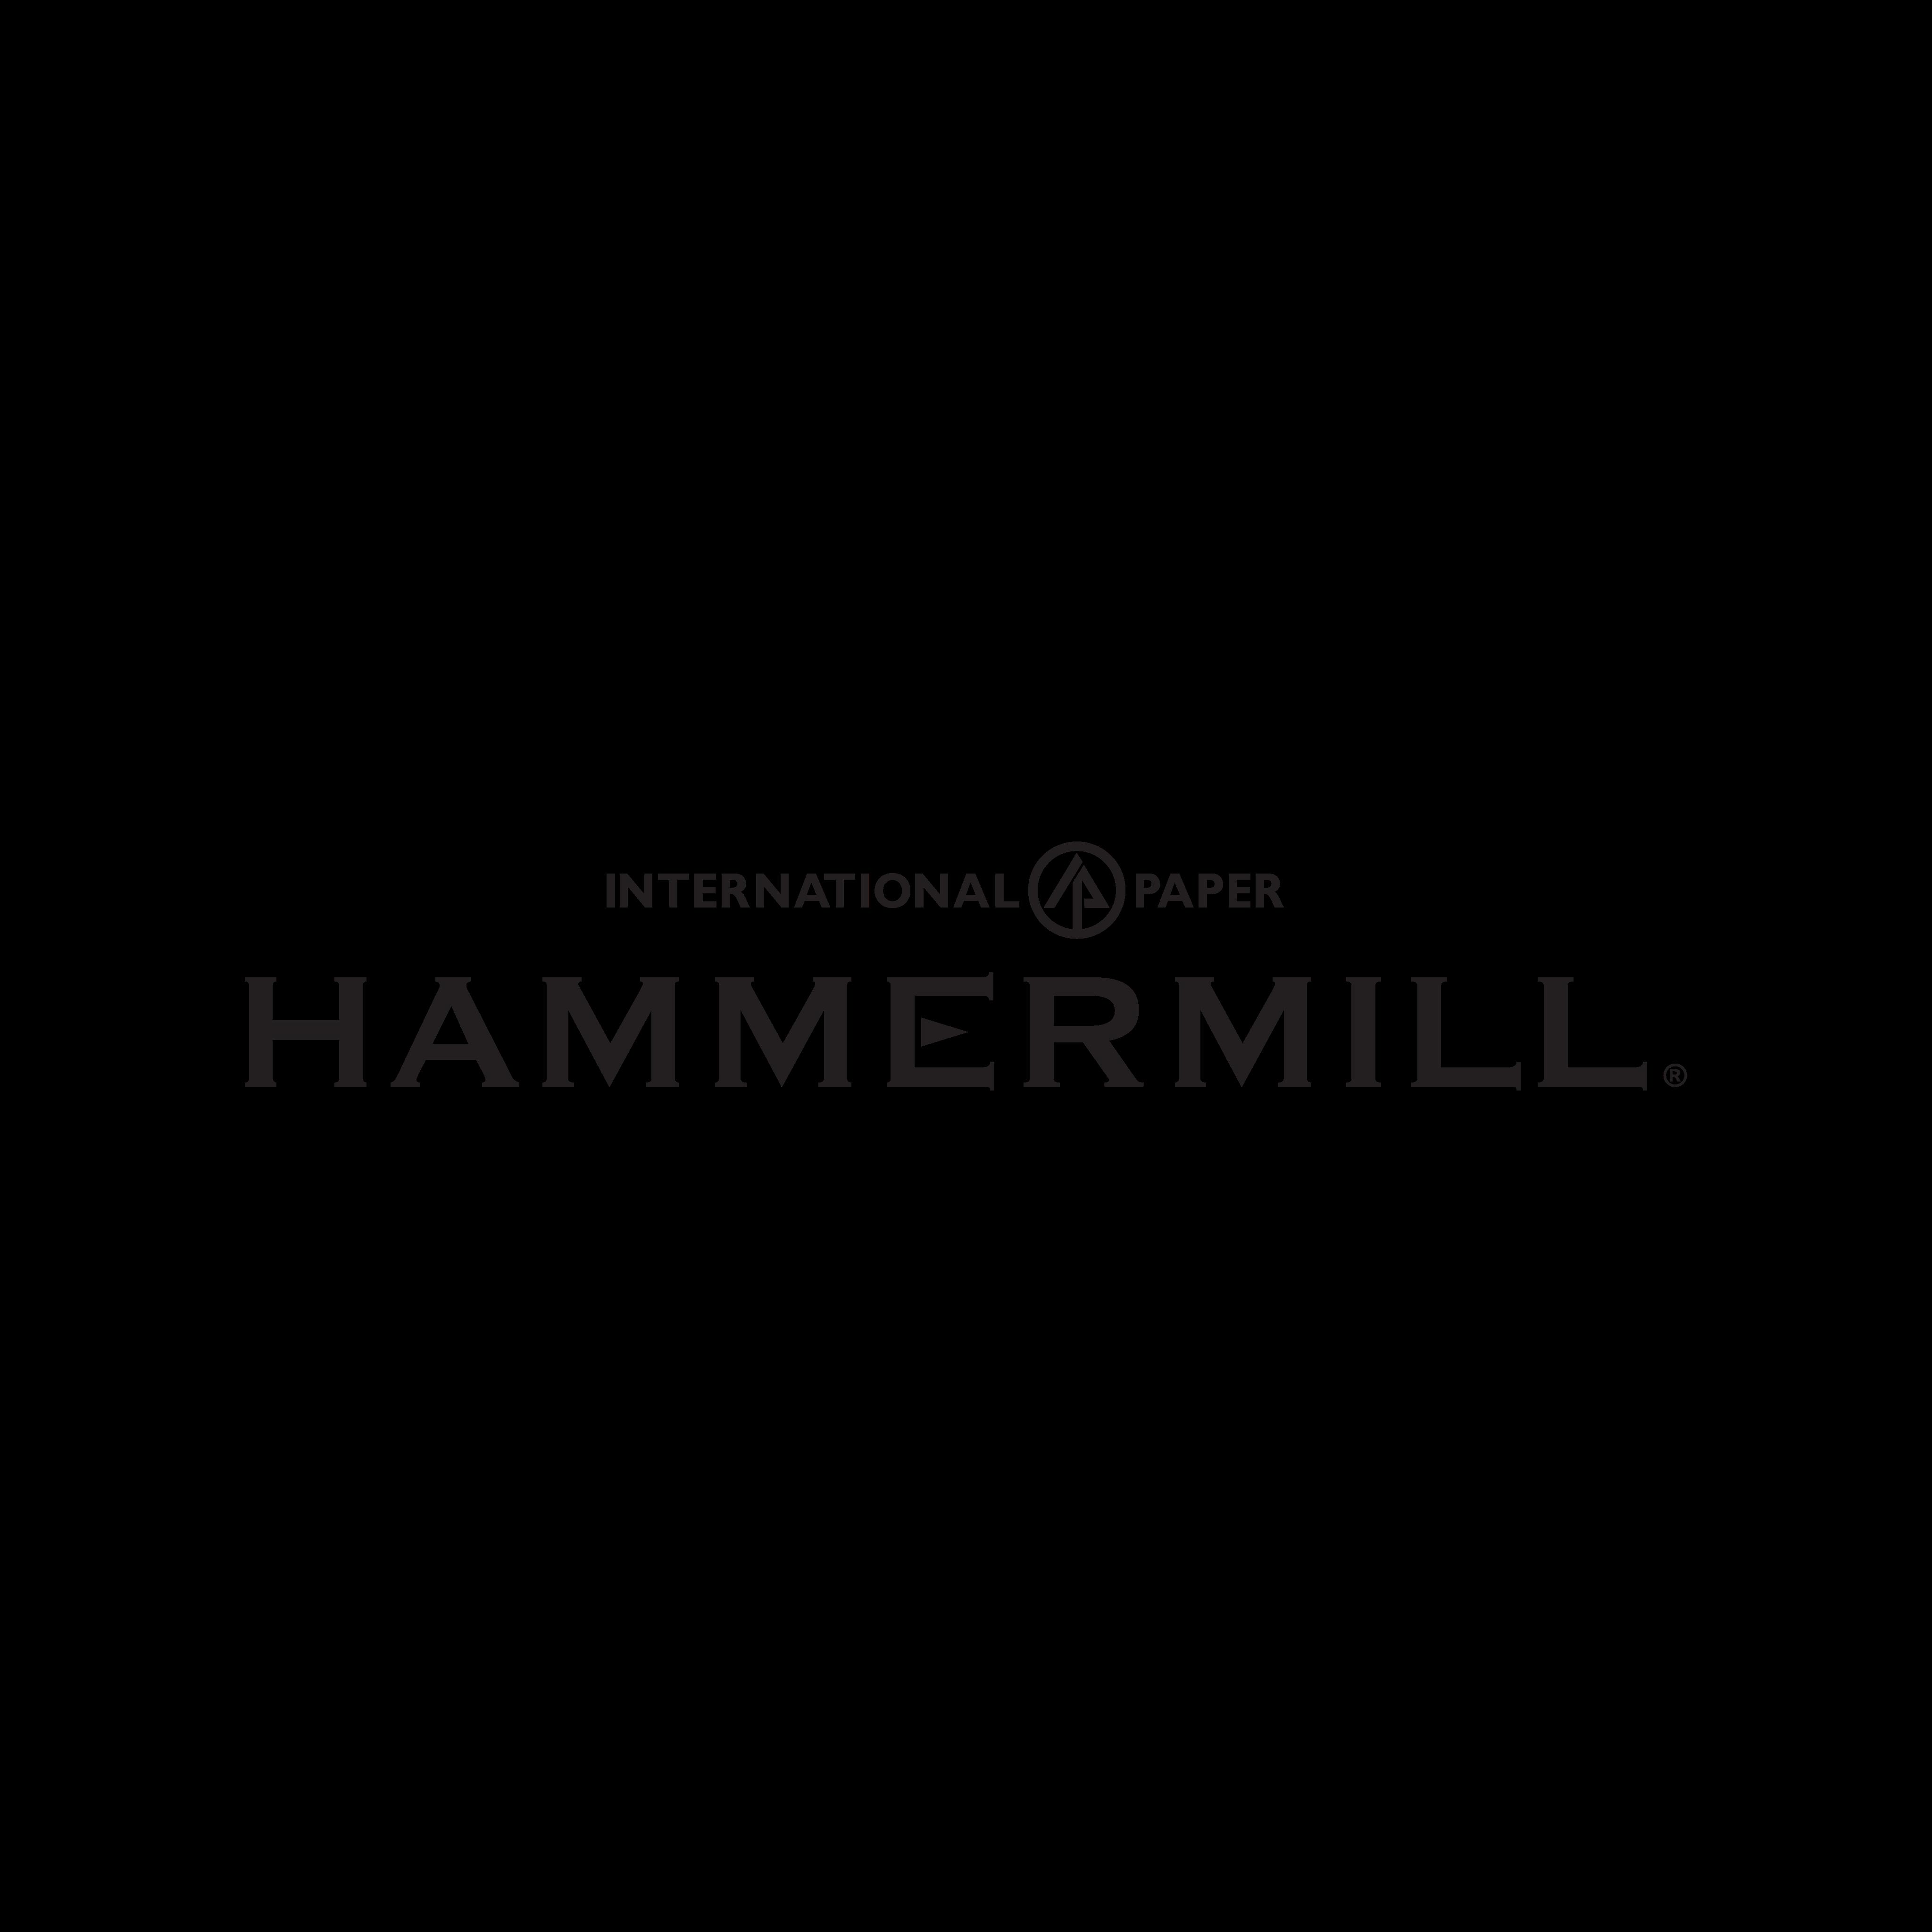 hammermill paper logo 0 - Hammermill Paper Logo